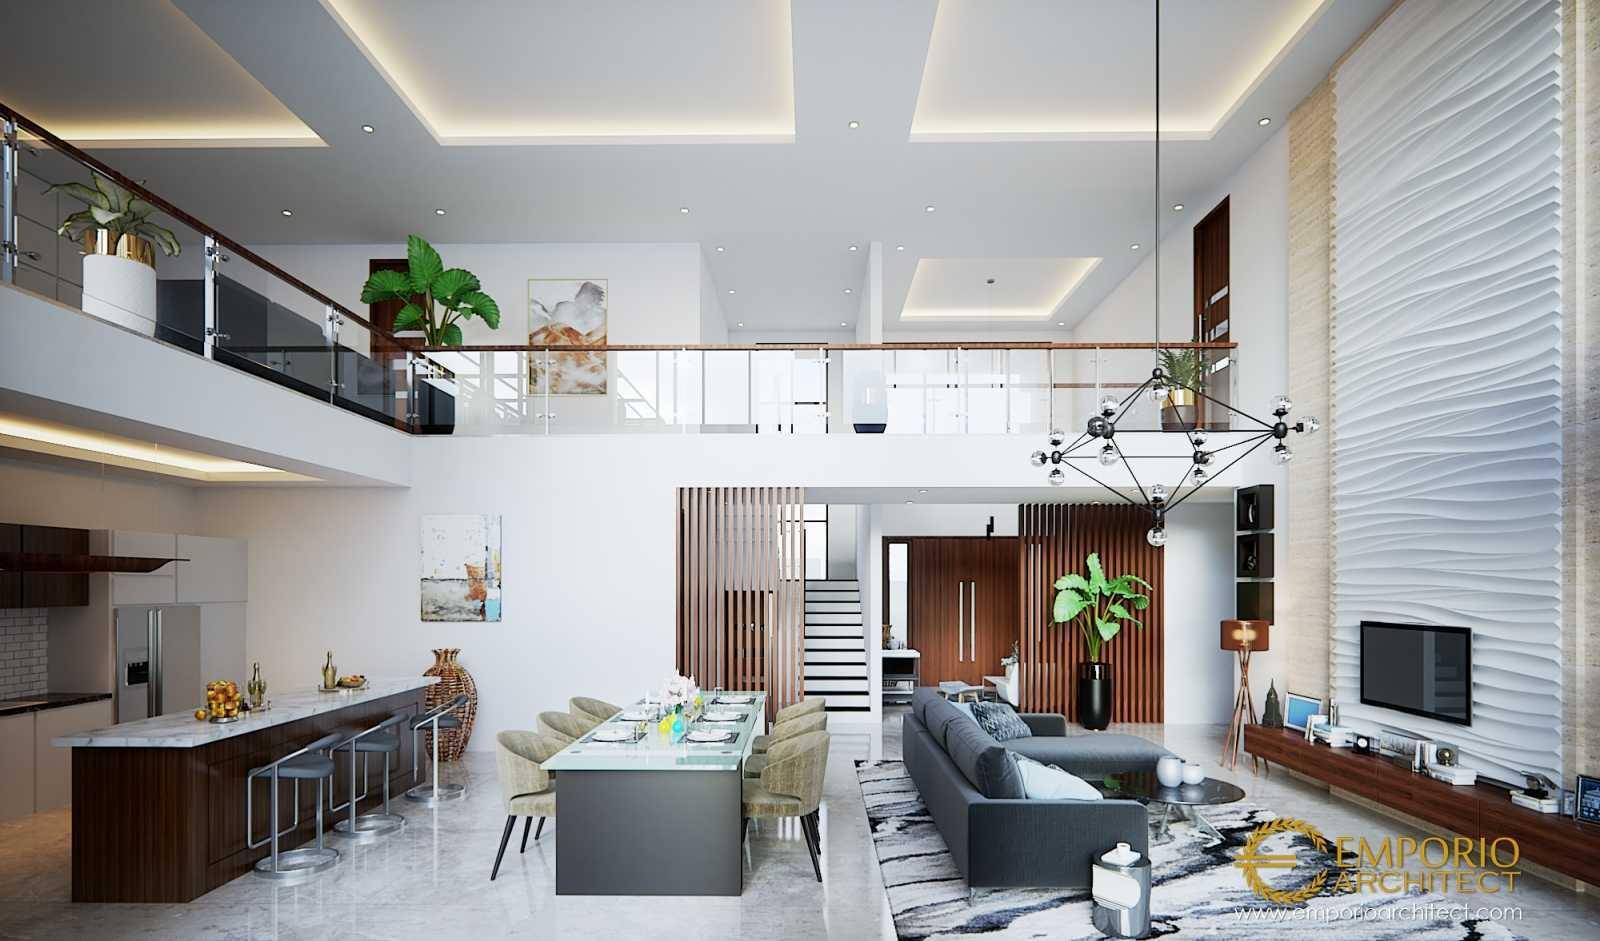 Emporio Architect Desain Rumah Modern Tropis 529 @ Sumatera Utara Sumatera Utara, Indonesia Sumatera Utara, Indonesia Emporio-Architect-Desain-Rumah-Modern-Tropis-529-Sumatera-Utara   77961